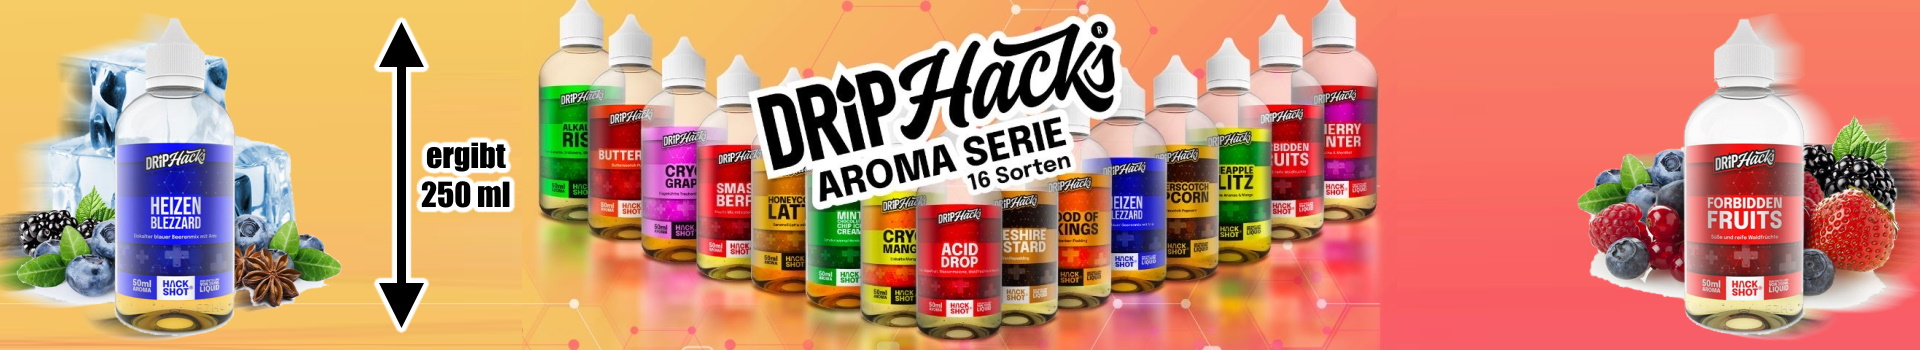 Drip Hacks - Aromen